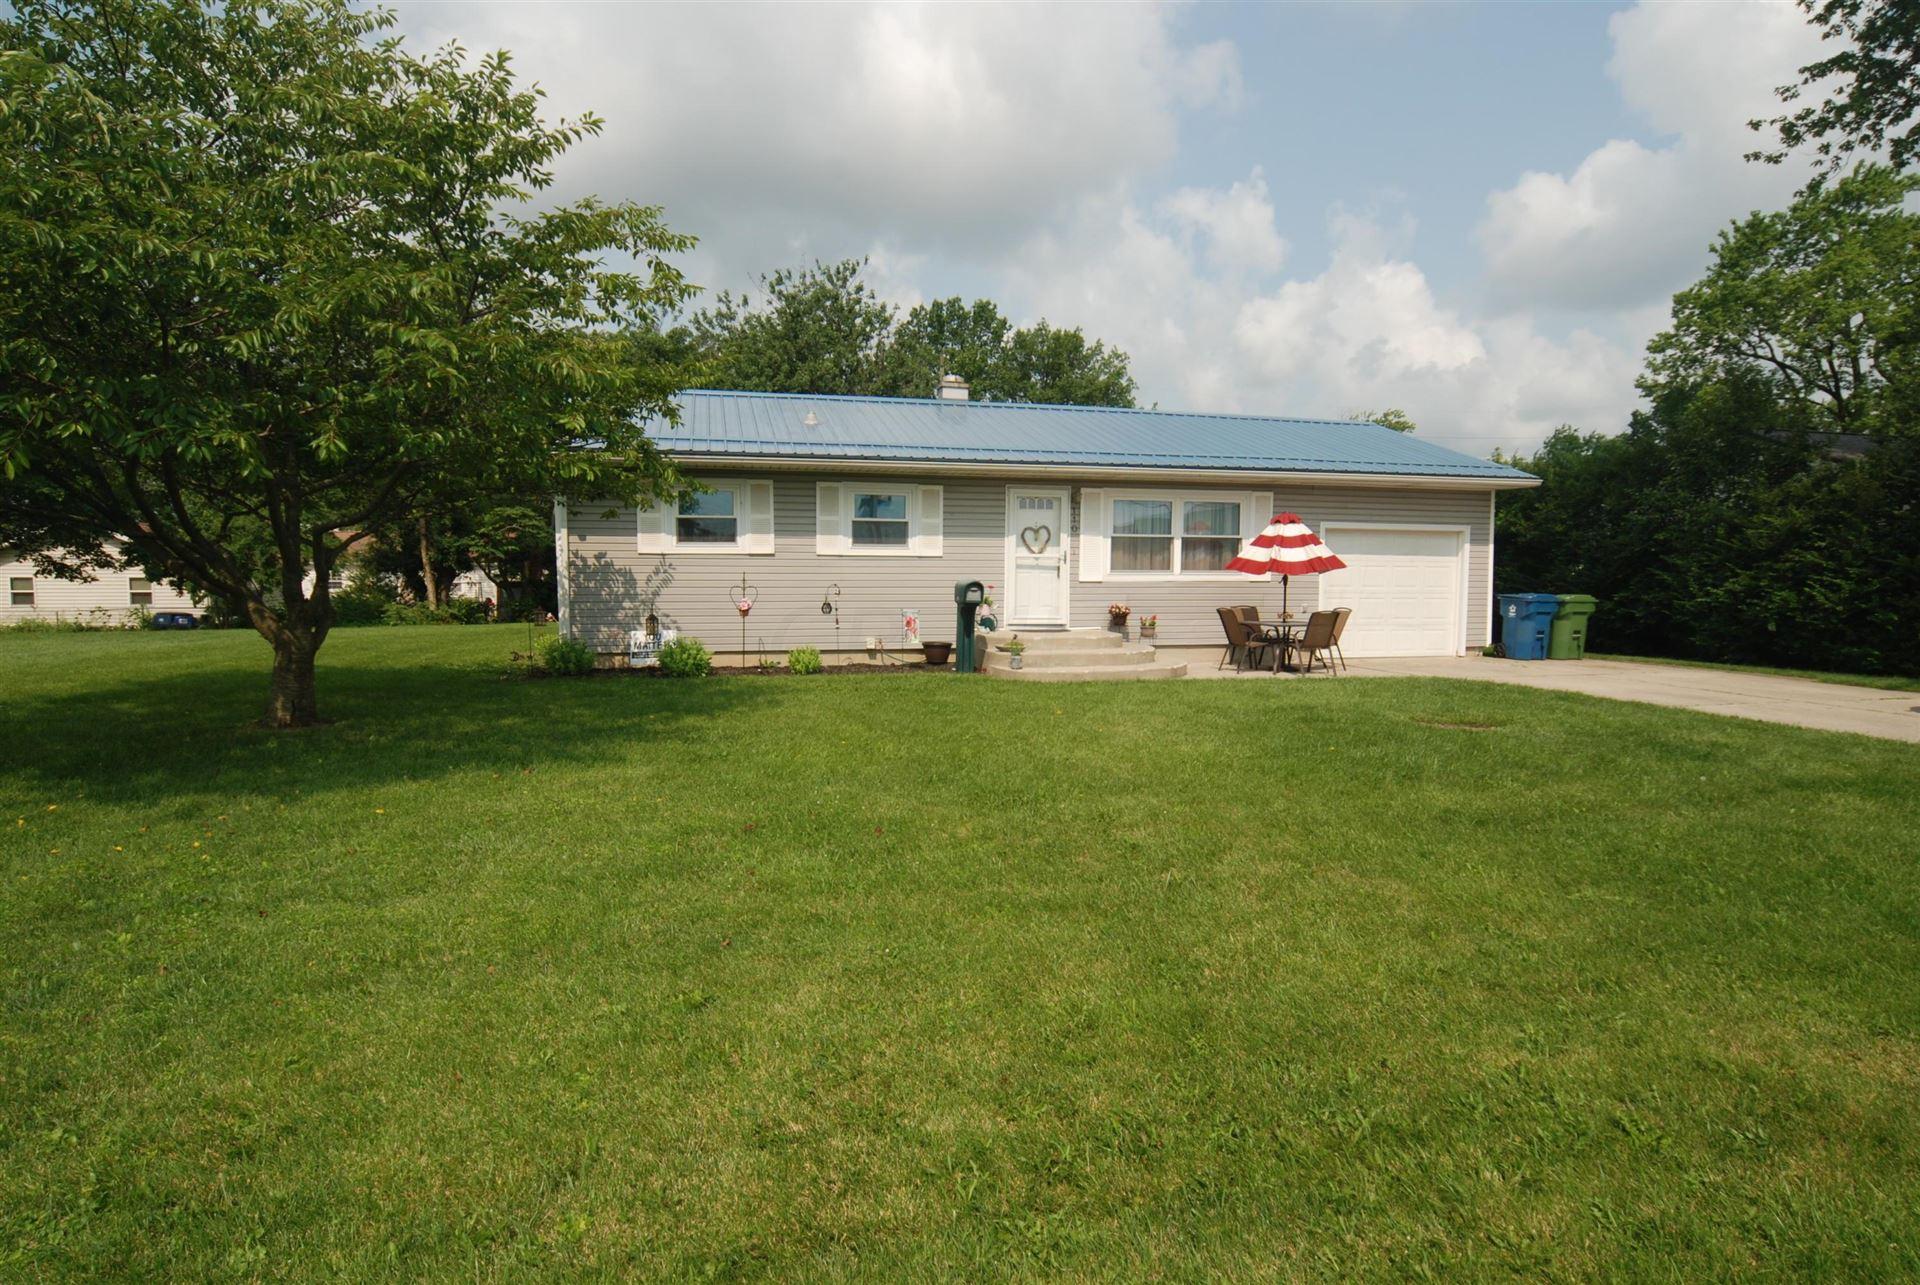 110 Connolly Street, Marysville, OH 43040 - MLS#: 221028655